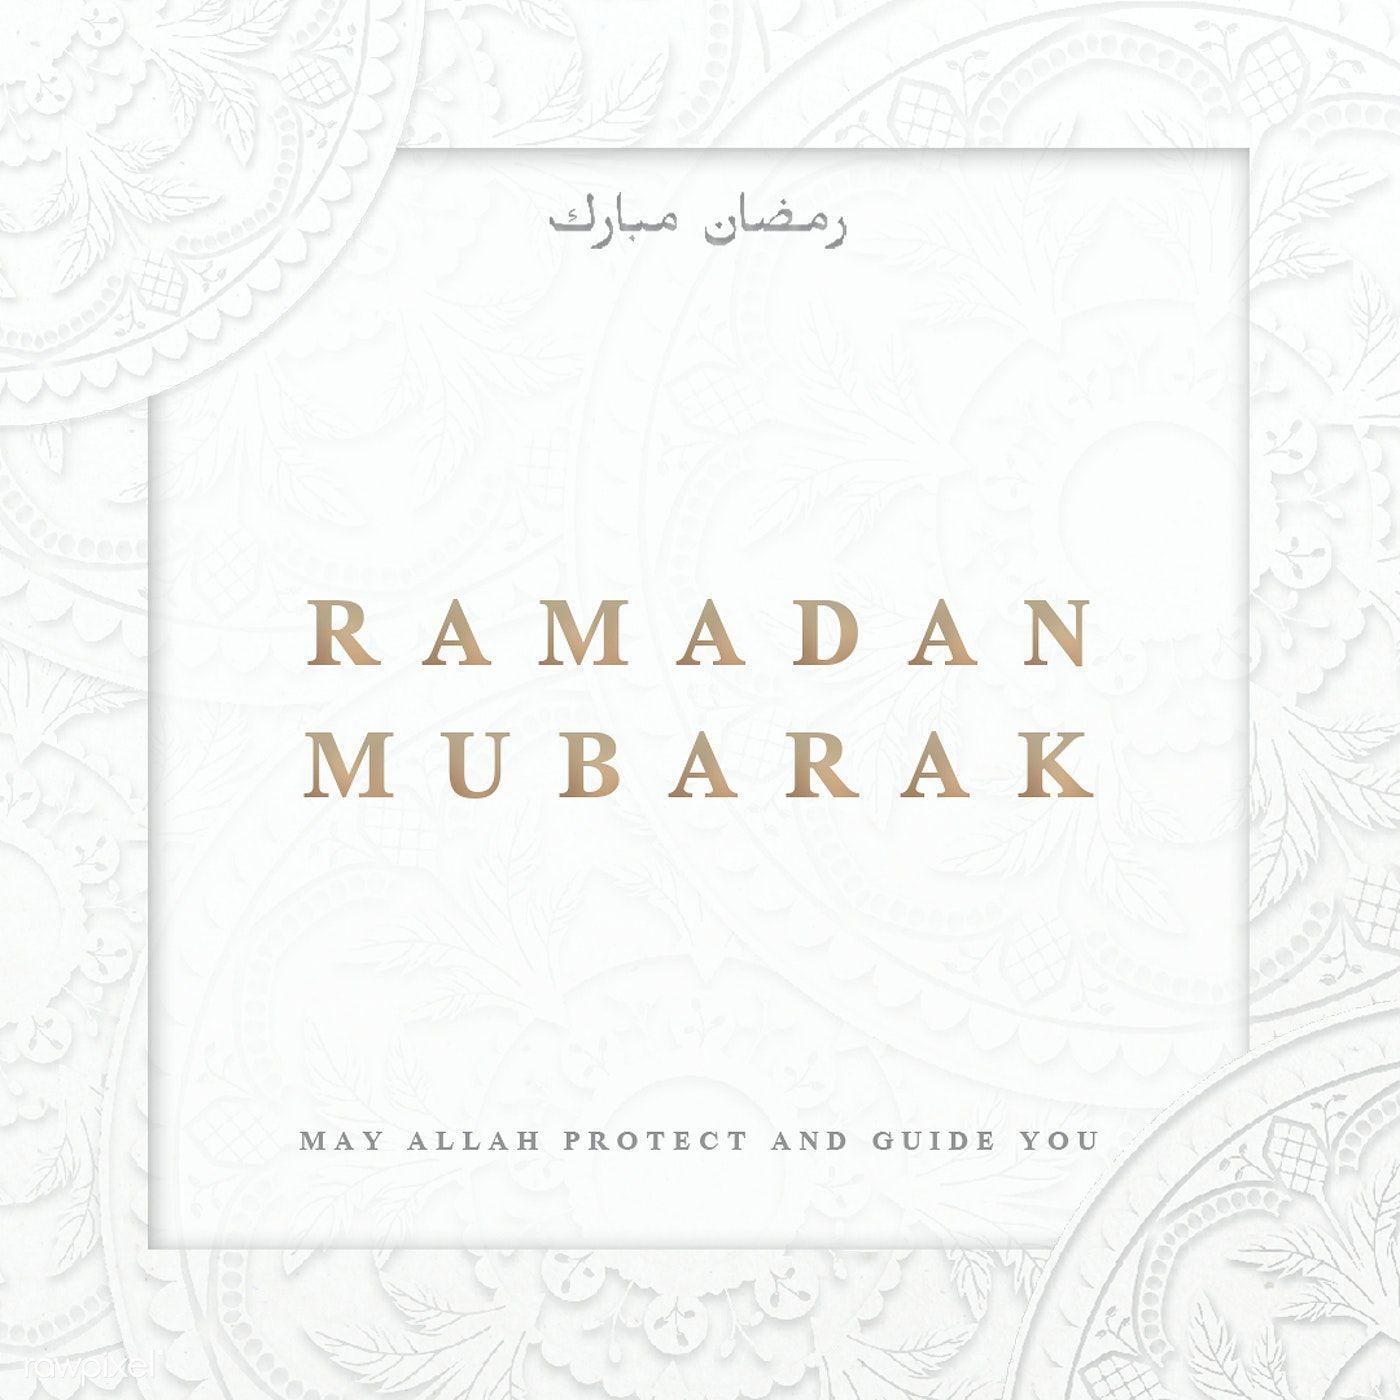 Pin By Turtle On Frame Design Ramadan Cards Ramadan Eid Mubarak Card